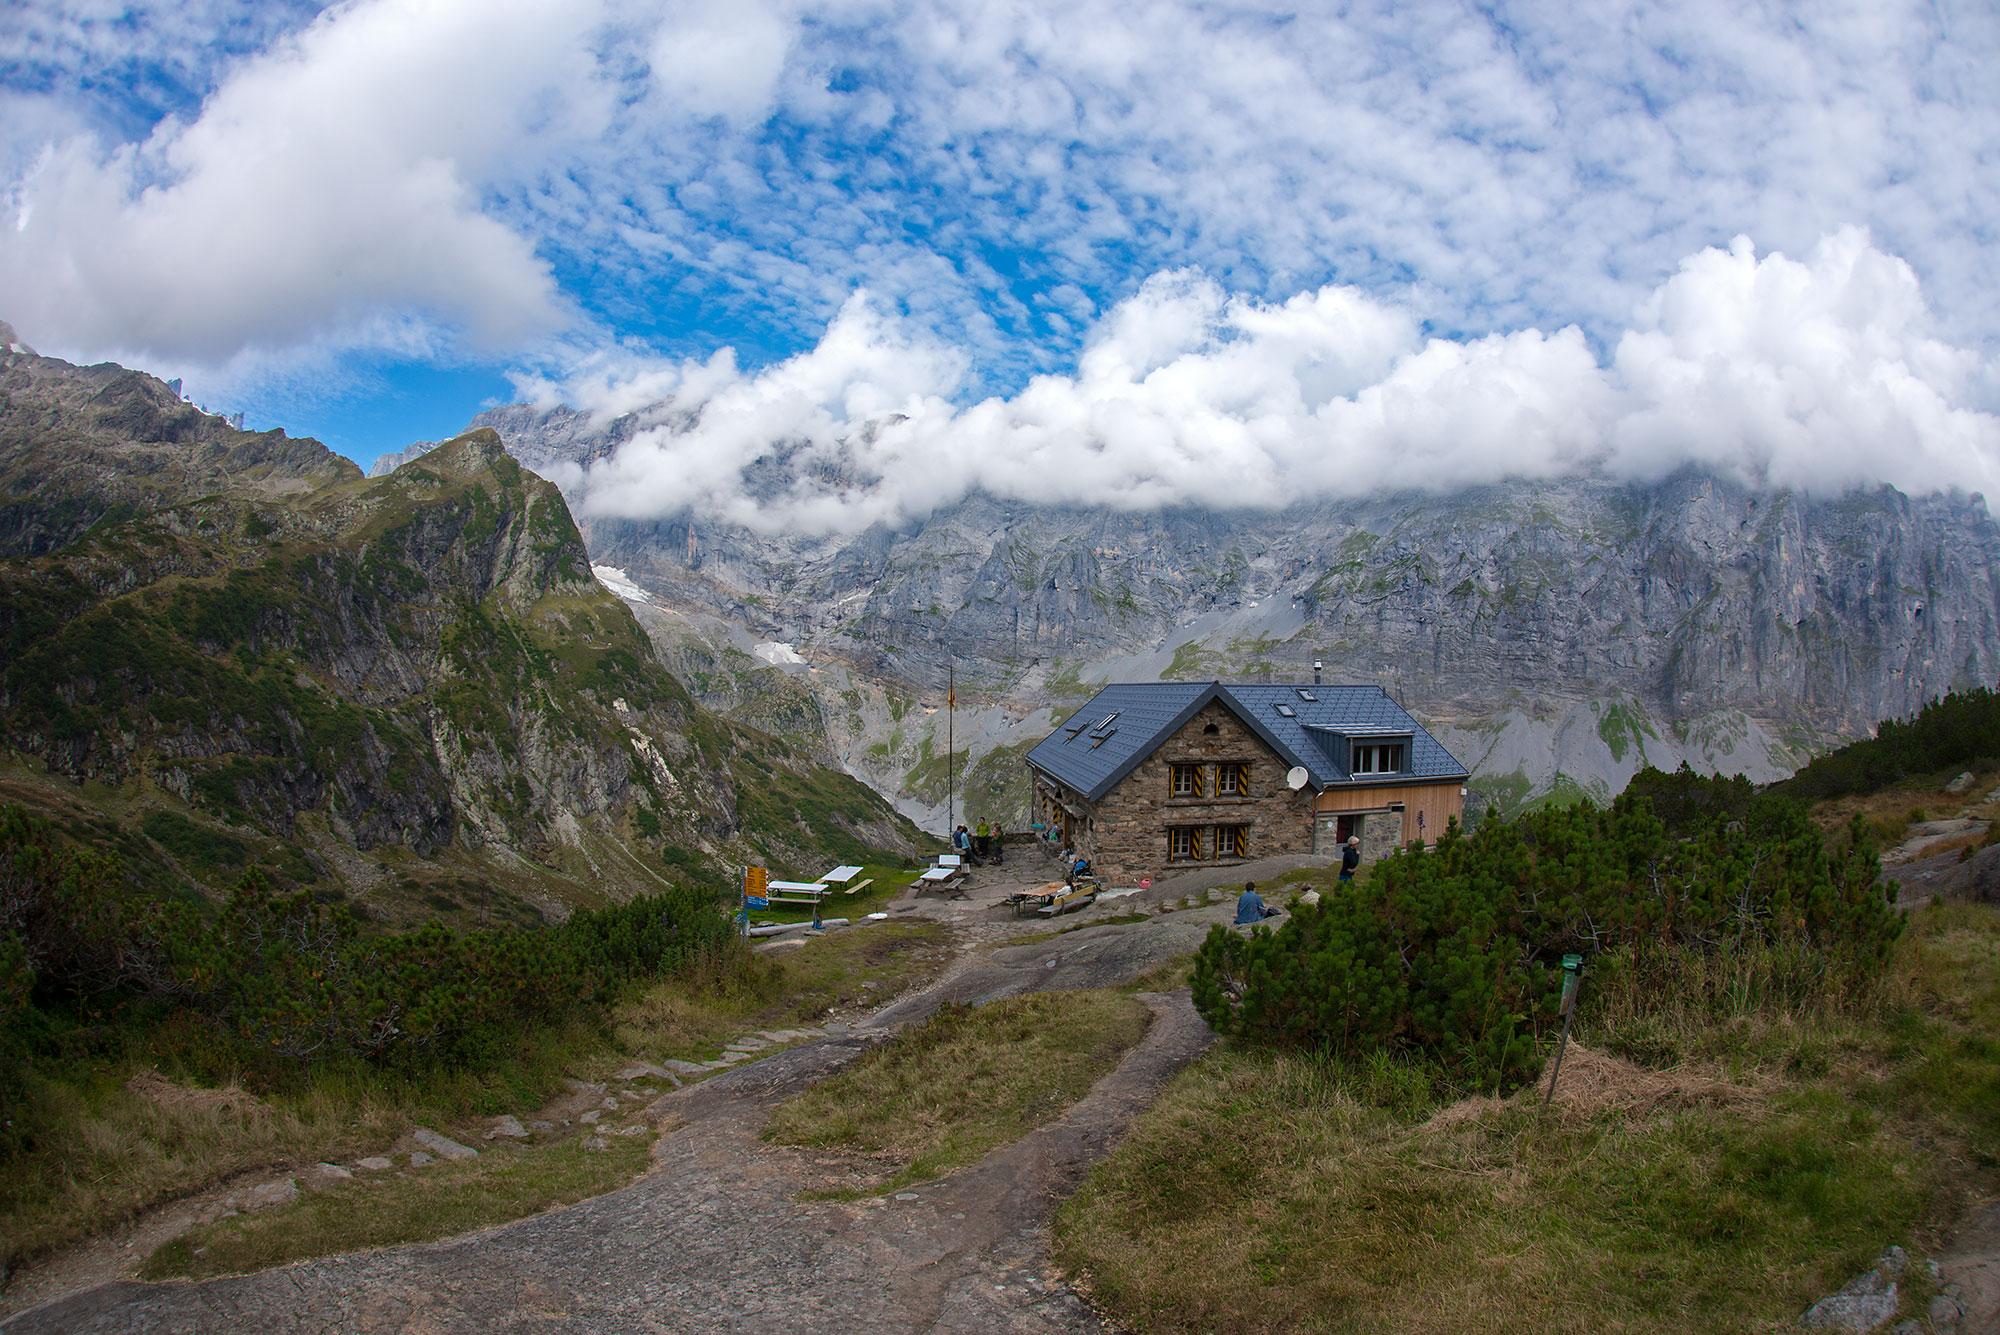 Kröntenhütte, Canton Uri - Switzerland